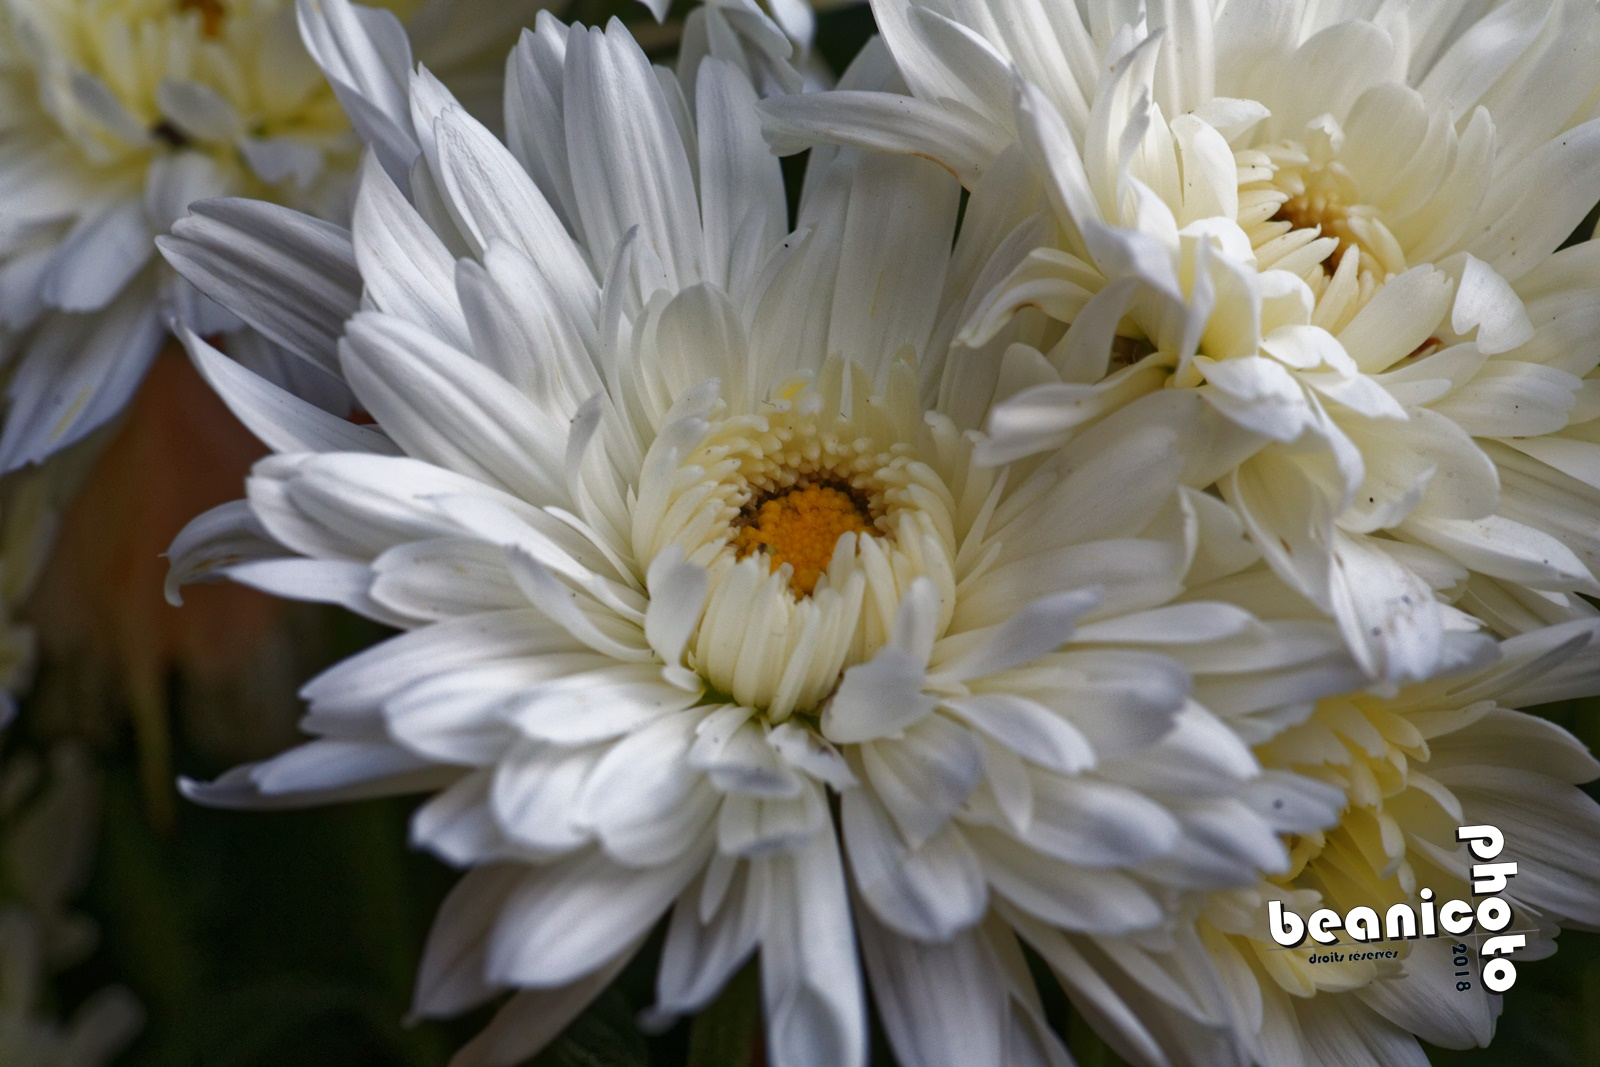 beanico-photo -Coeur de Fleur - Canon 5D IV + Tamron 90mm macro + Kenko 1,5x